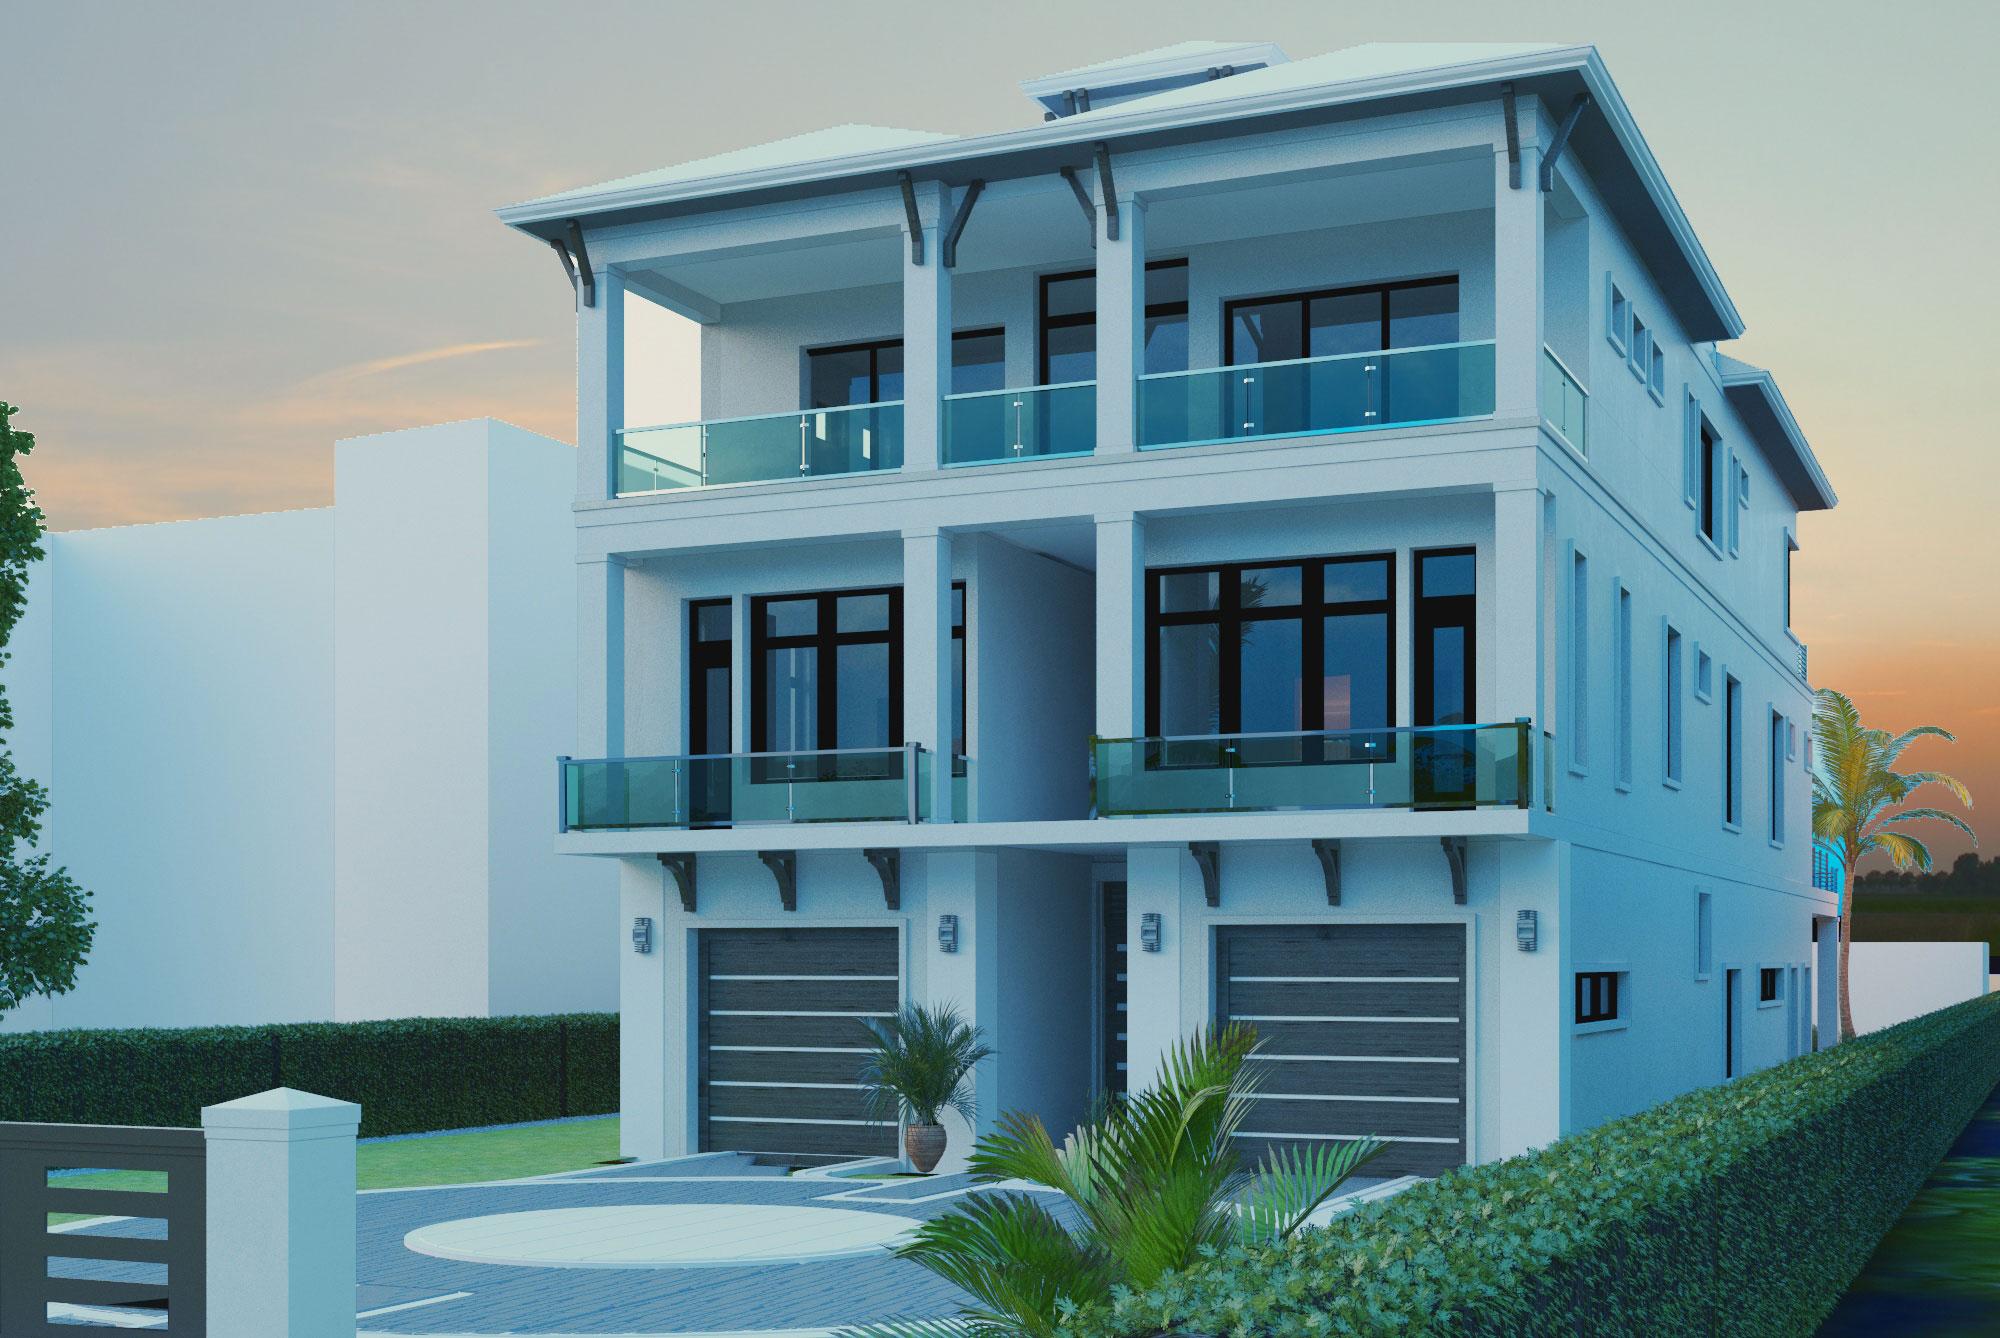 New Diamond Custom Home in Bonita Beach at 26385 Hickory Boulevard